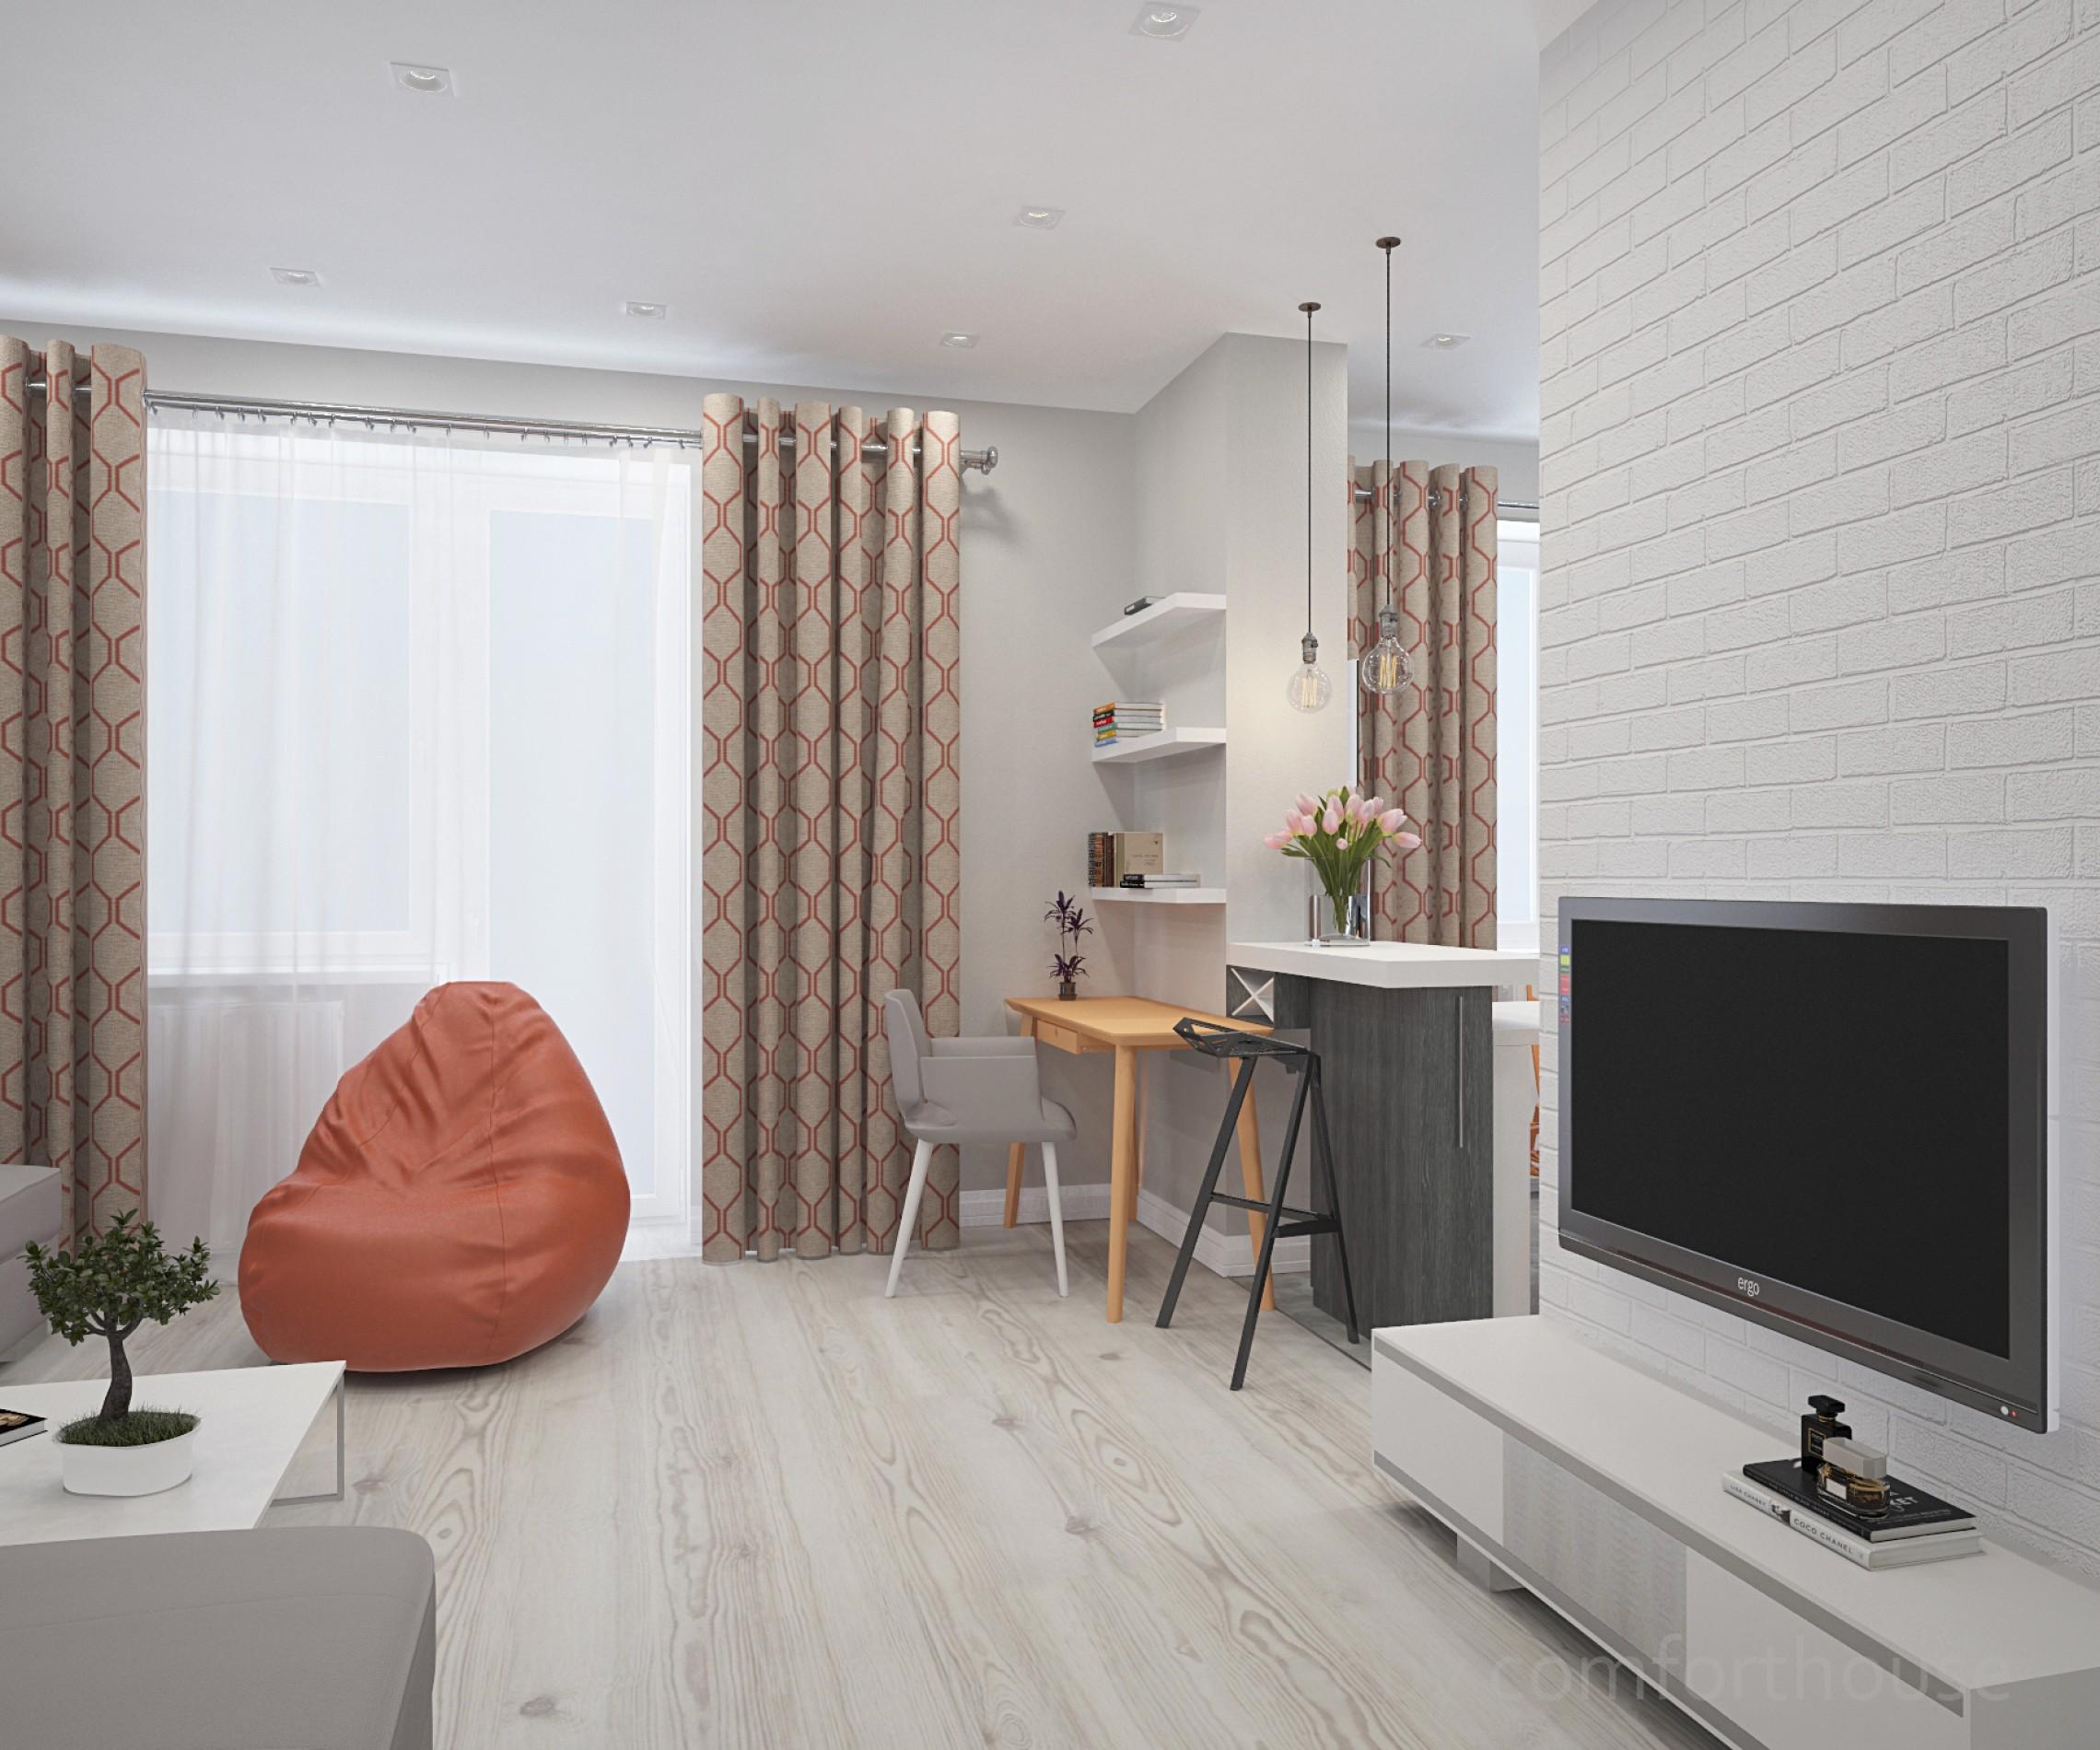 white and orange interior